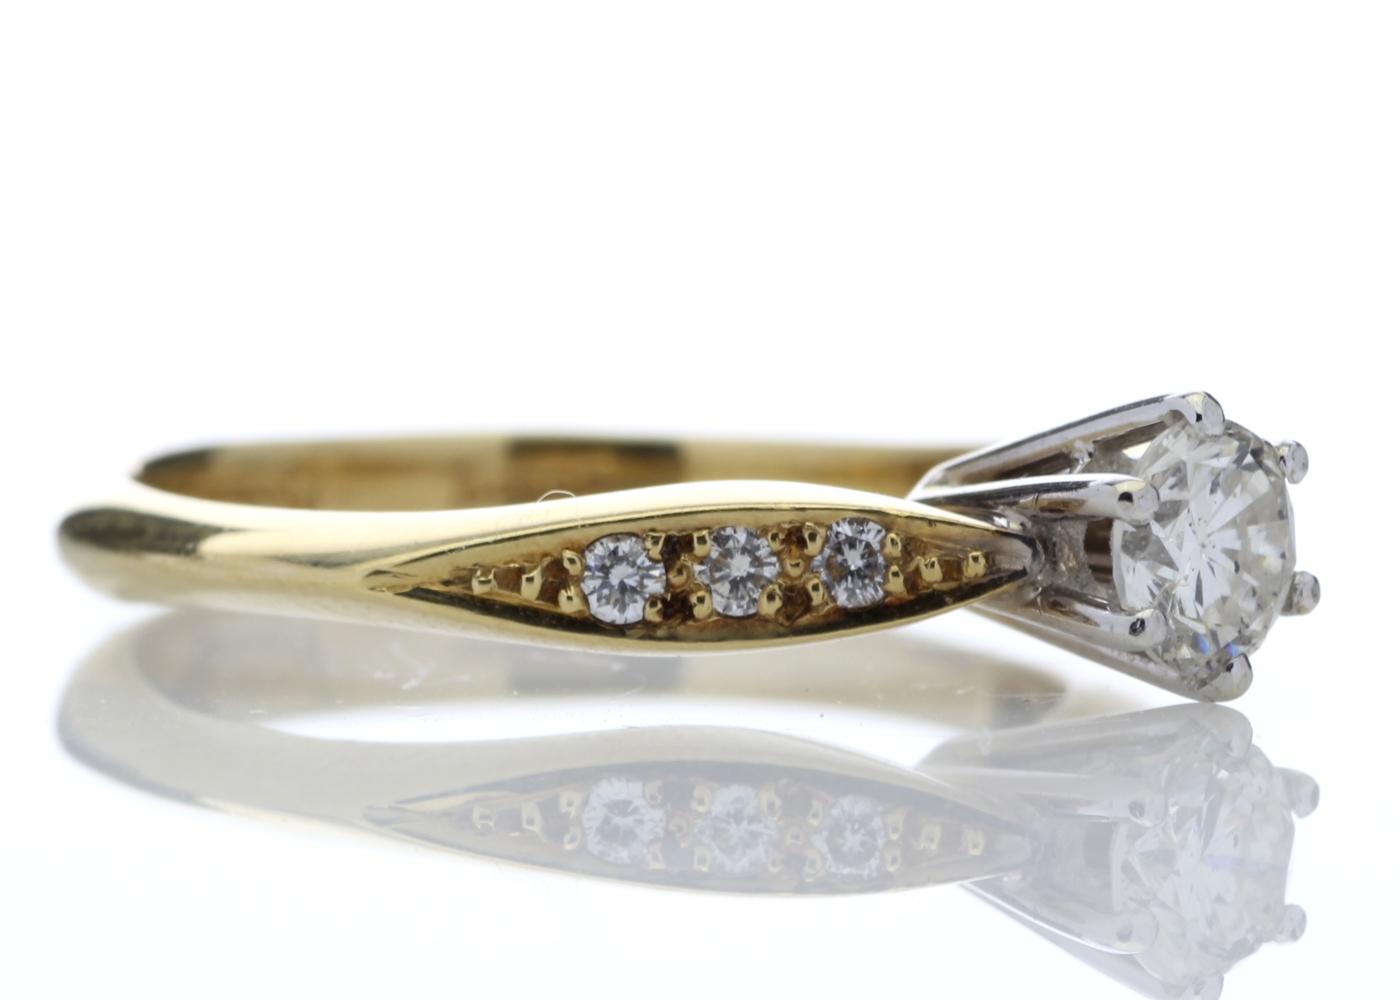 18ct Stone Set Shoulders Diamond Ring 0.42 Carats - Image 4 of 4